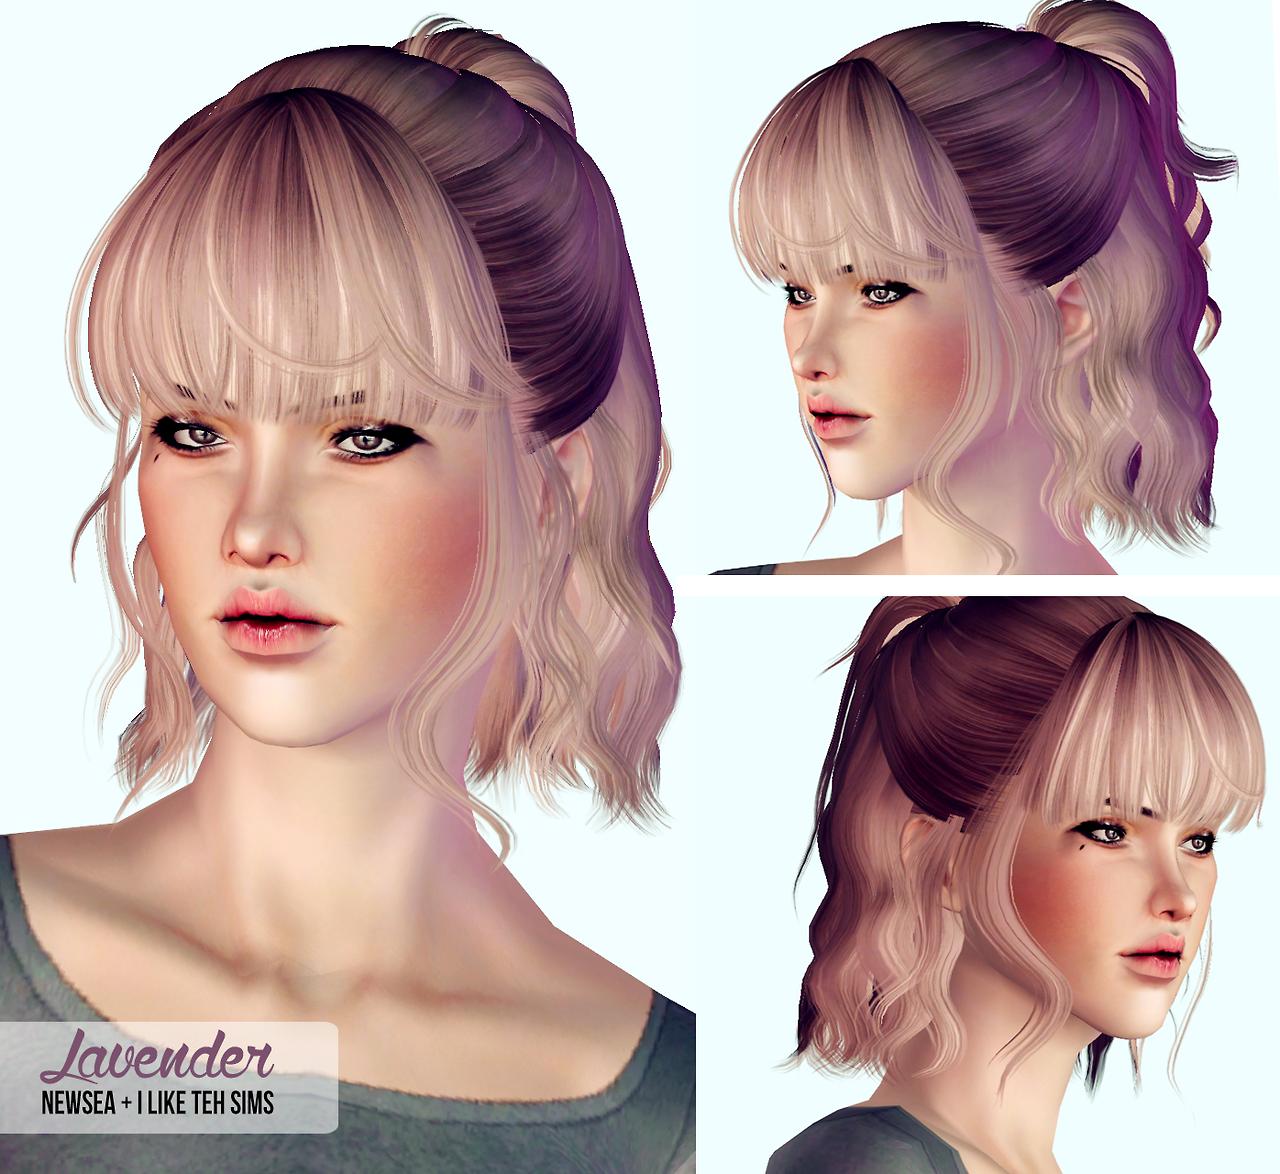 My Sims 3 Blog: Hair Retextures by I Like Teh Sims